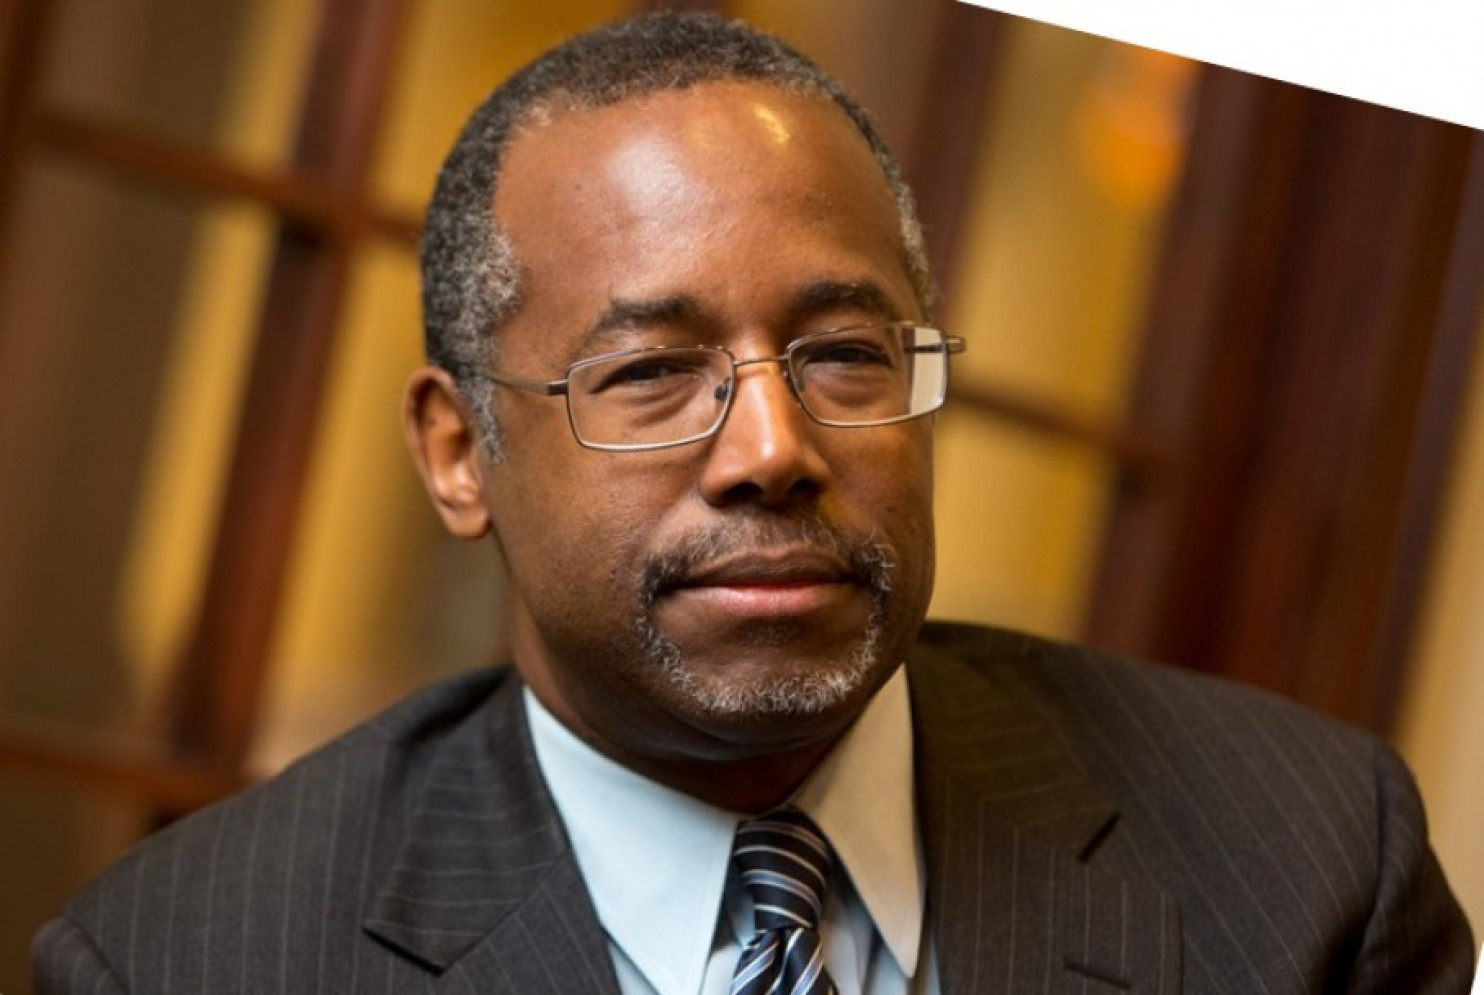 Secretary Ben Carson Totally Destroys Rep. Ilhan Omar With Devastating Tweet